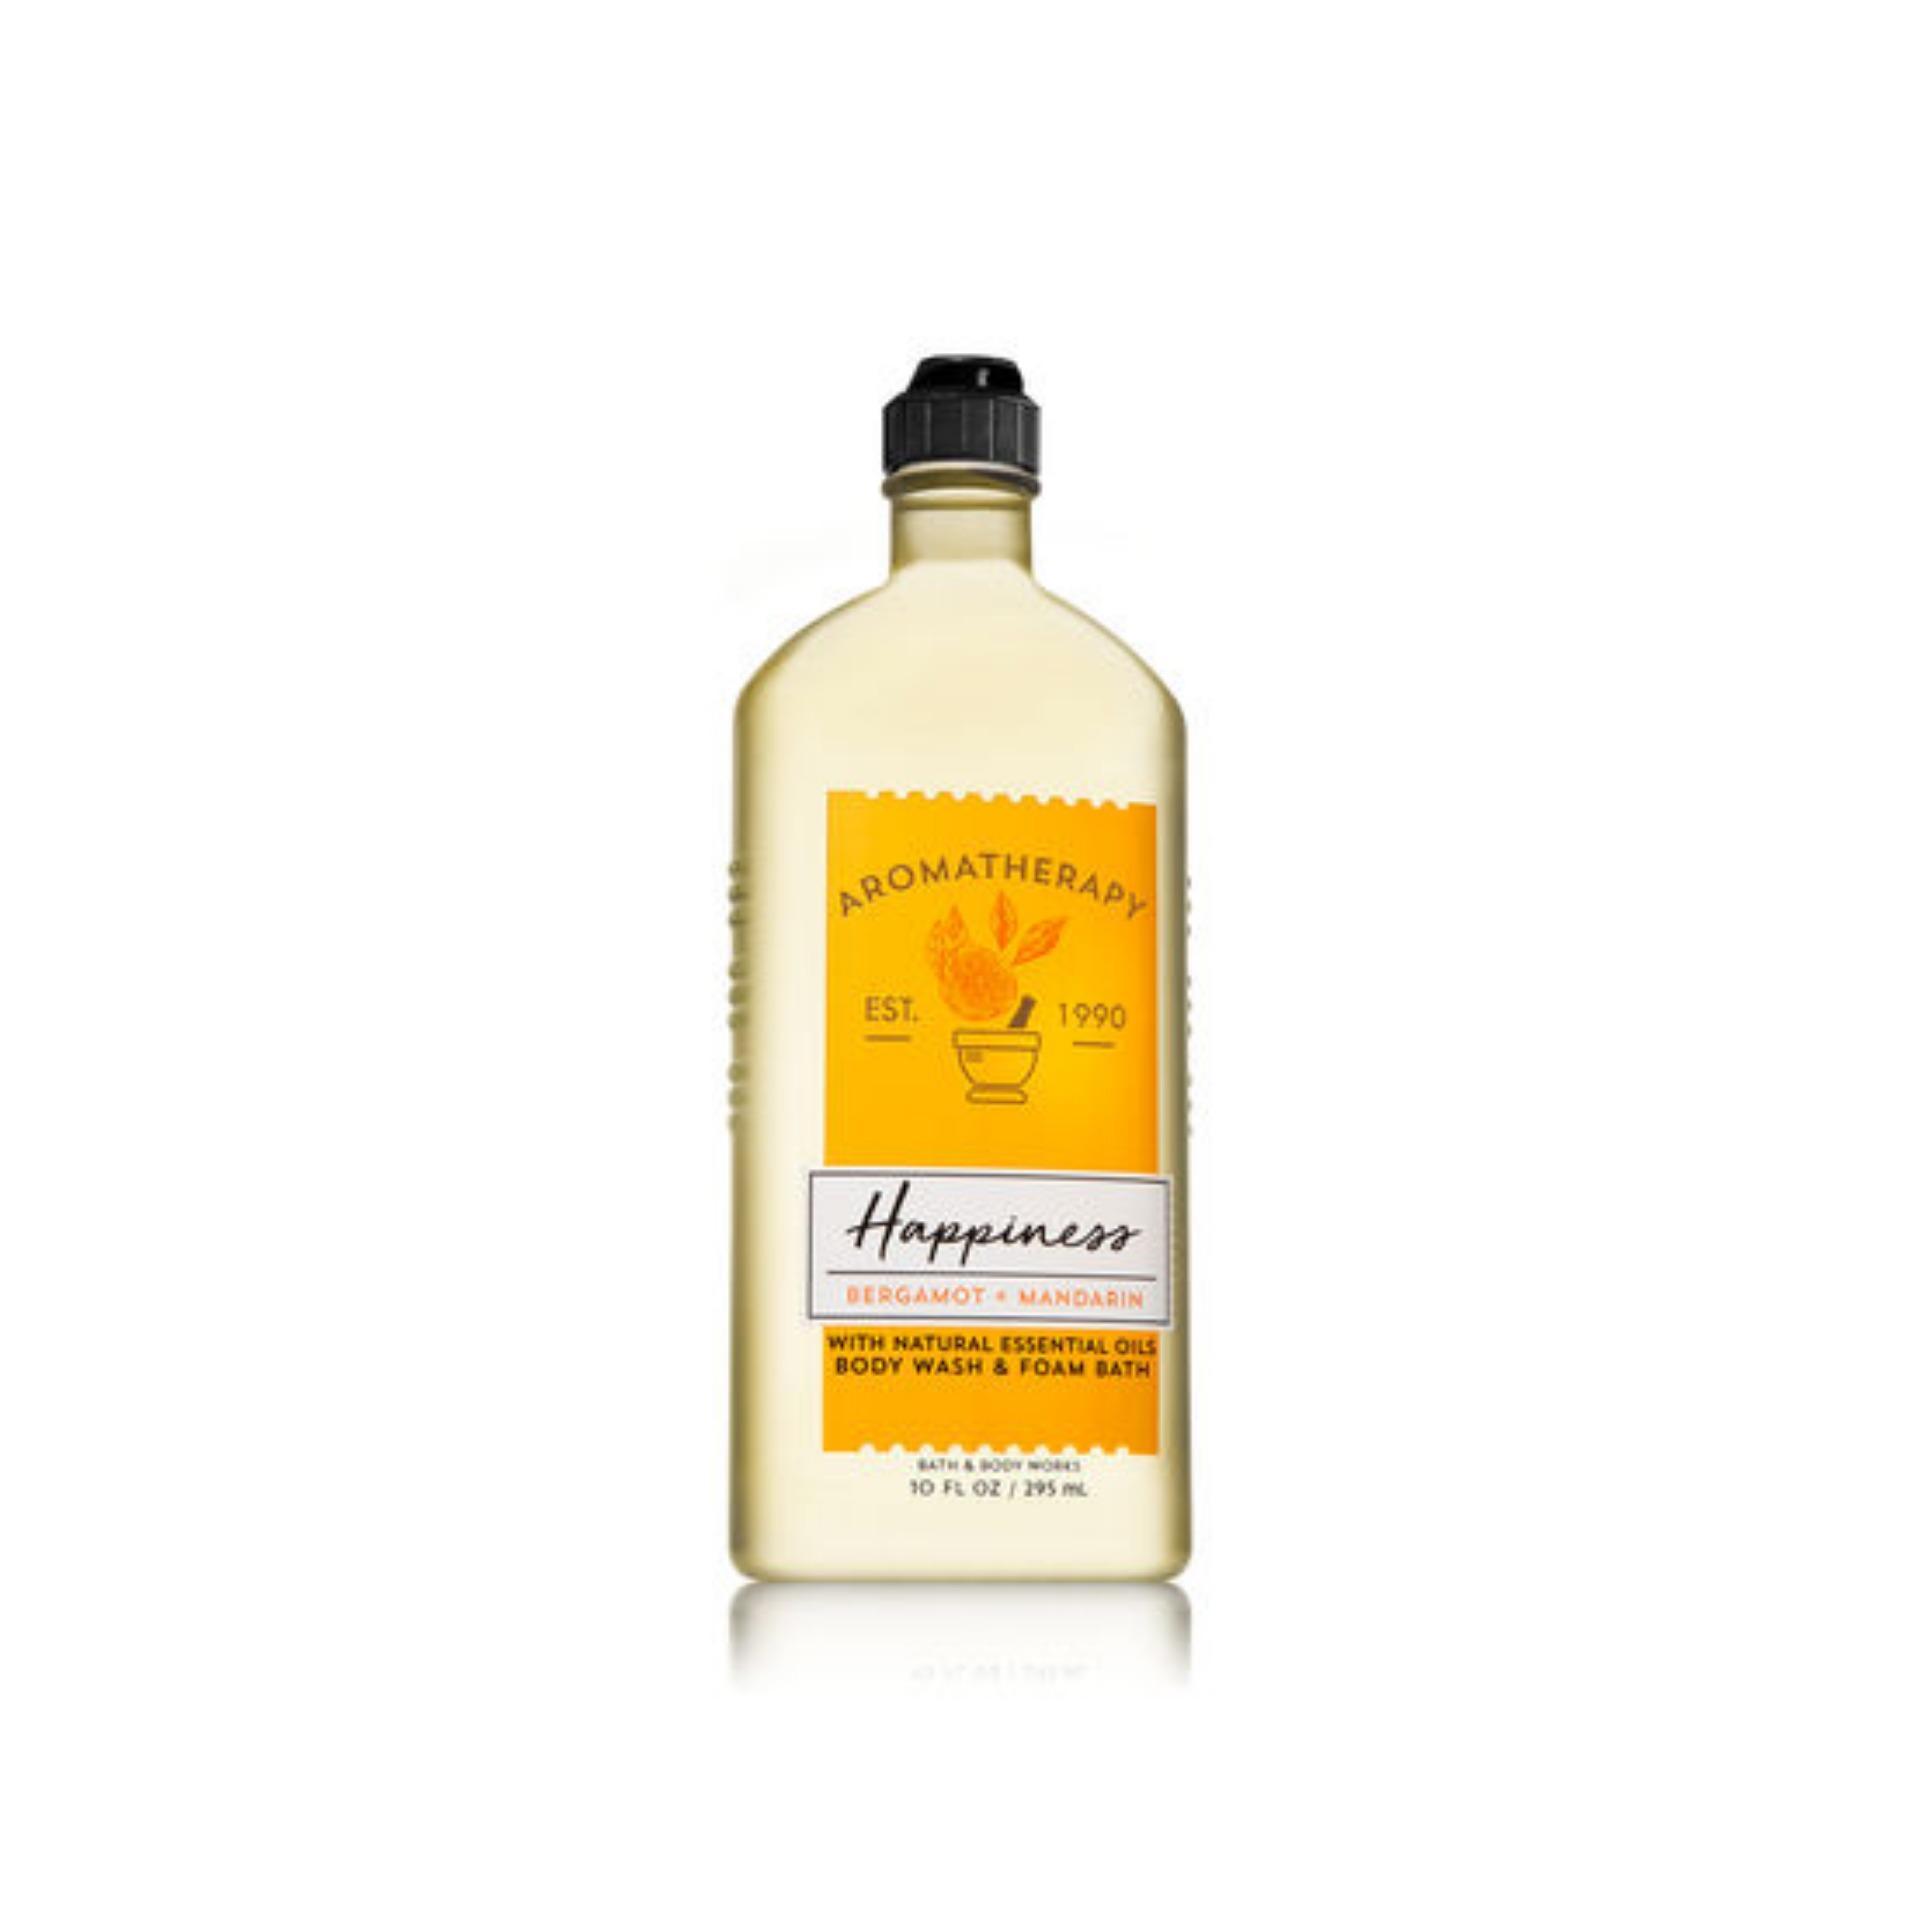 Mã Khuyến Mại Happiness Bergamot Mandarin Body Wash Foam Bath Rẻ